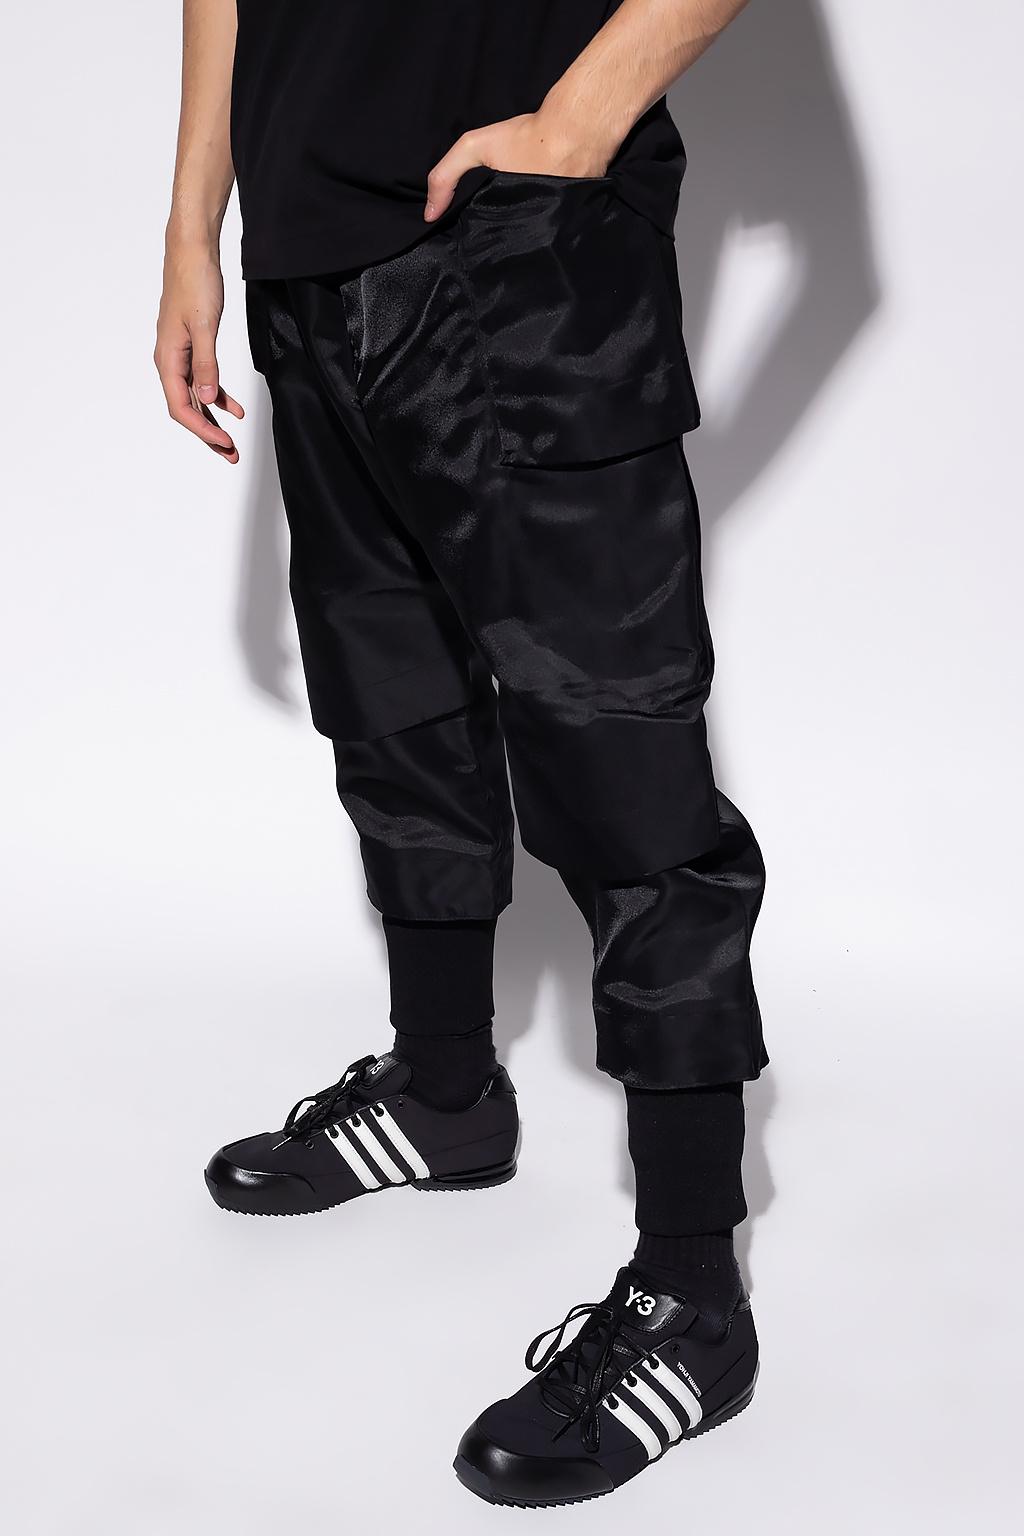 Y-3 Yohji Yamamoto Trousers with pockets